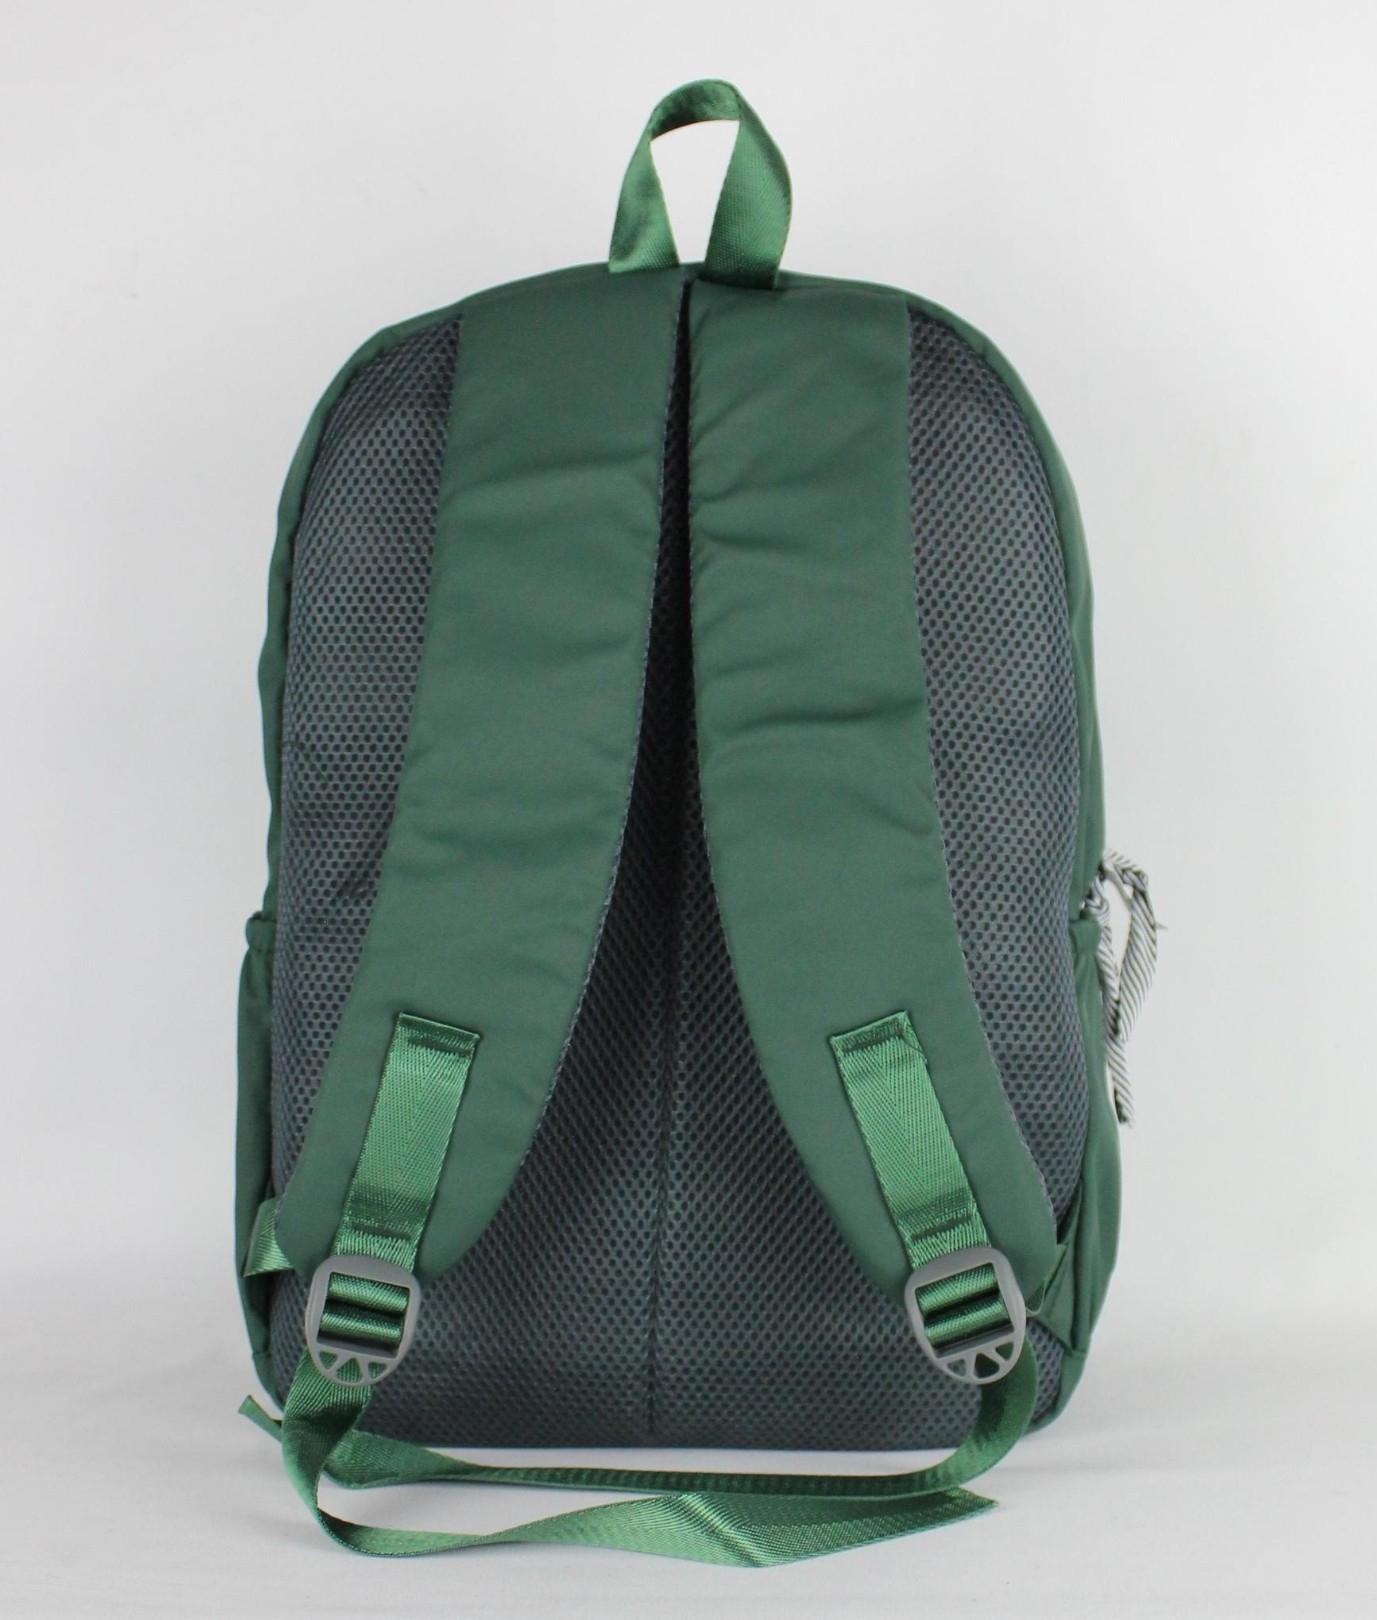 Backpack Florencia - Green